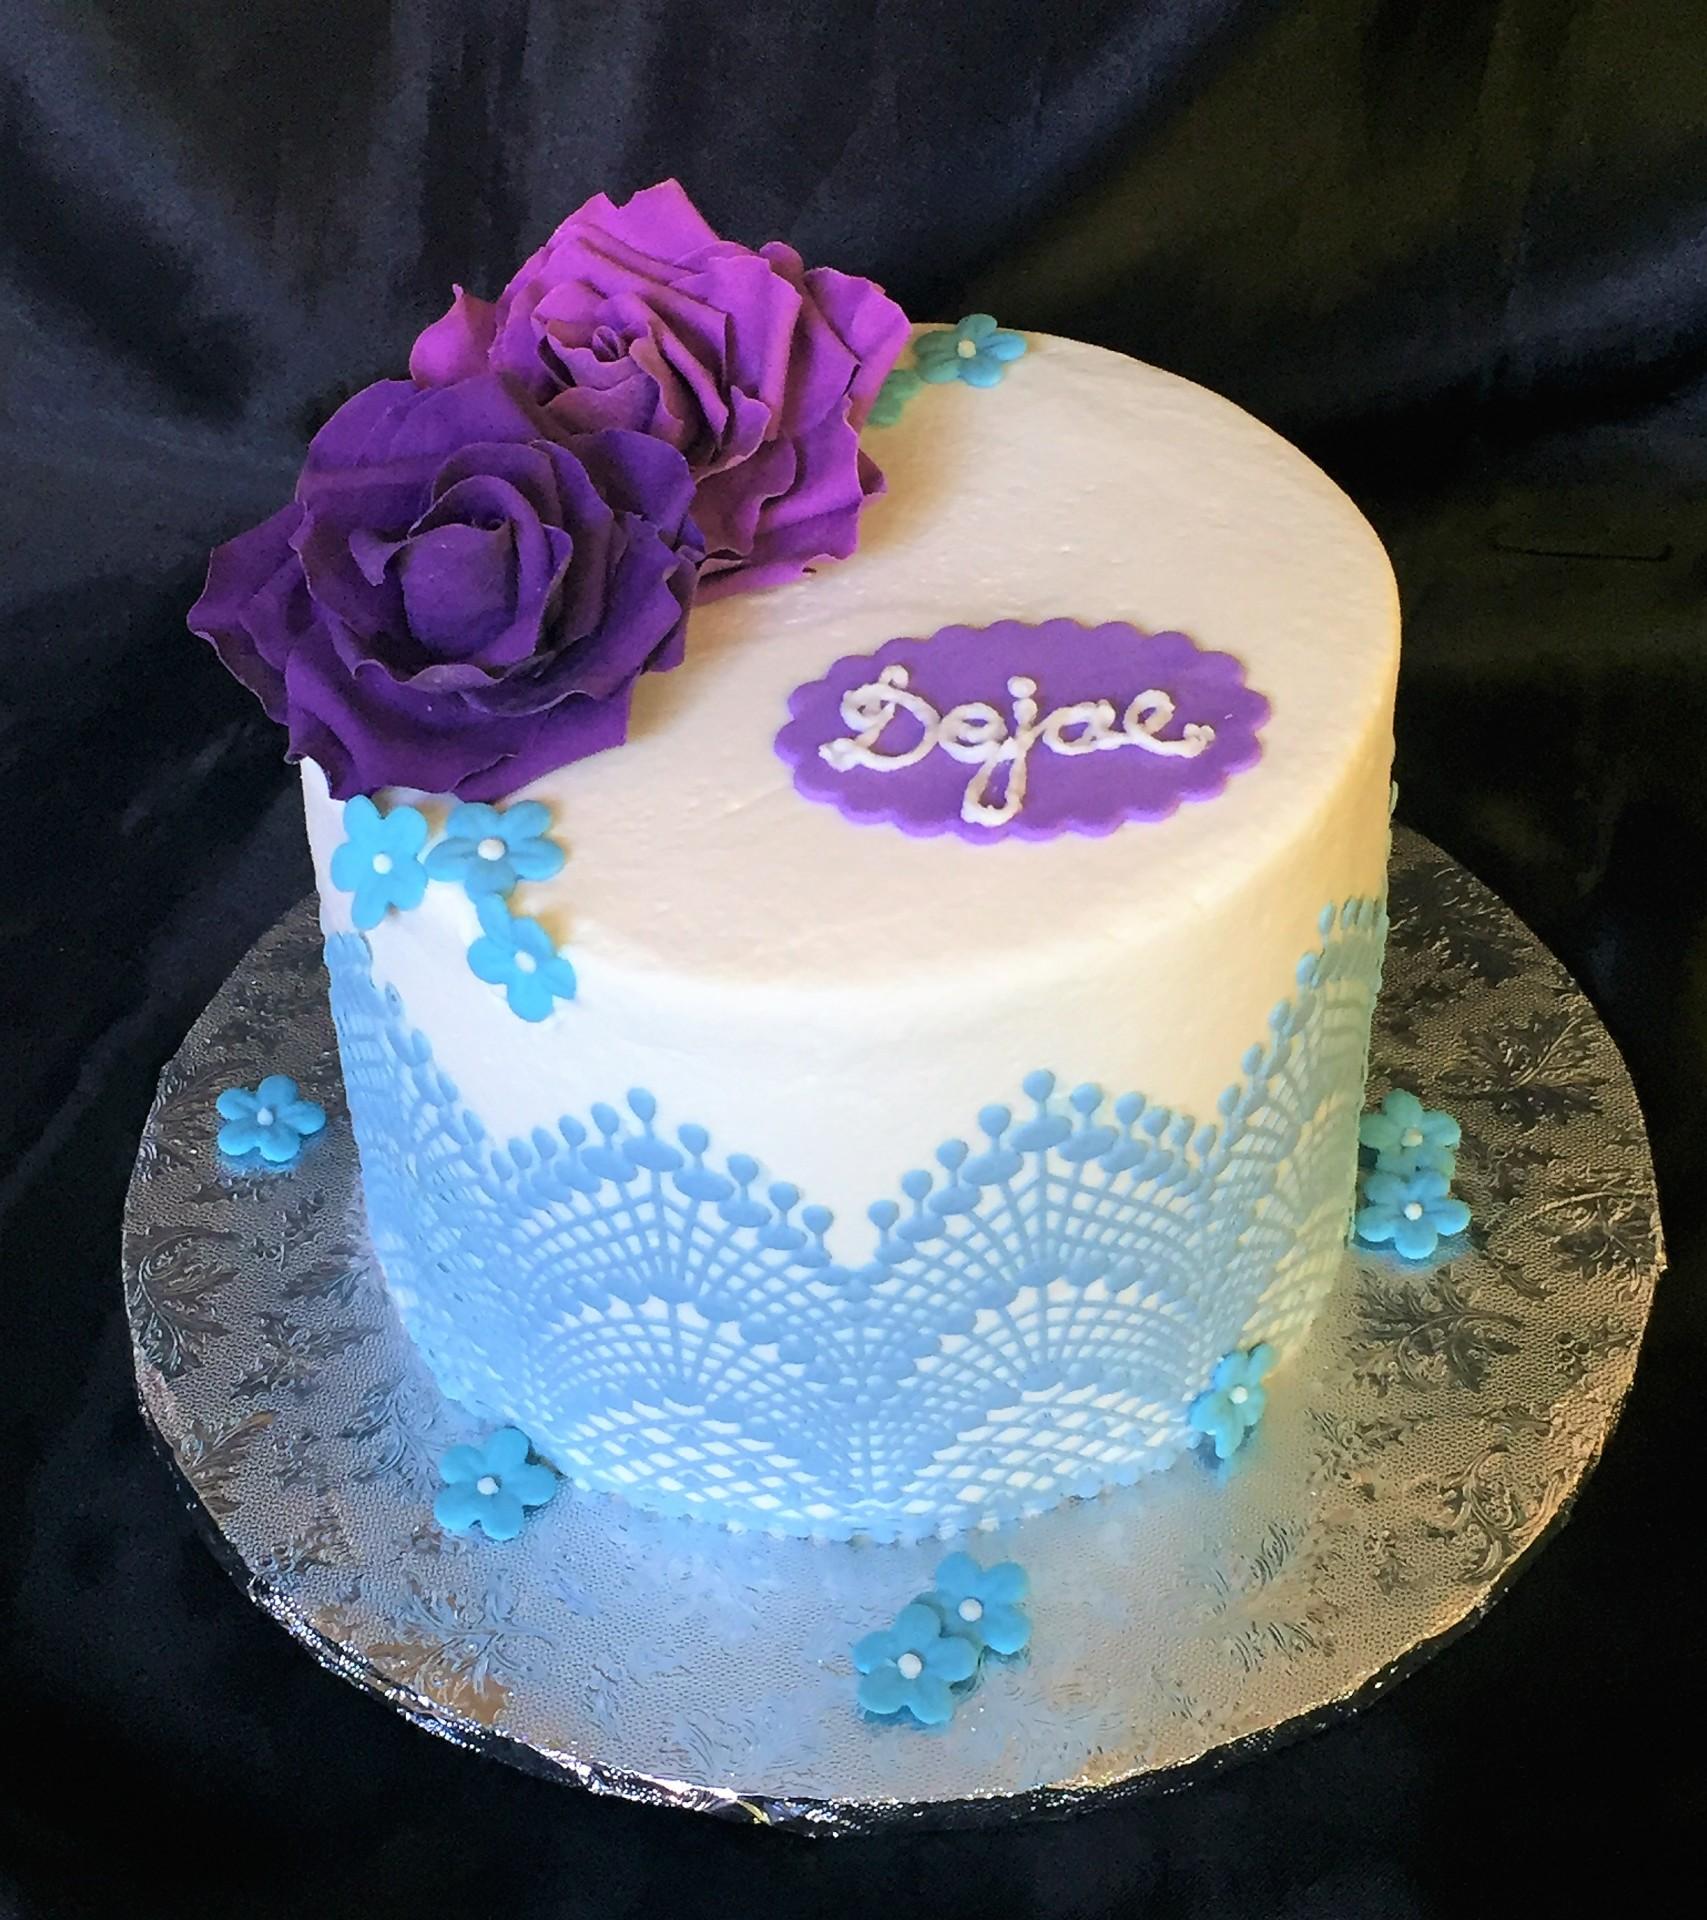 Sky blue sugar lace lavender roses